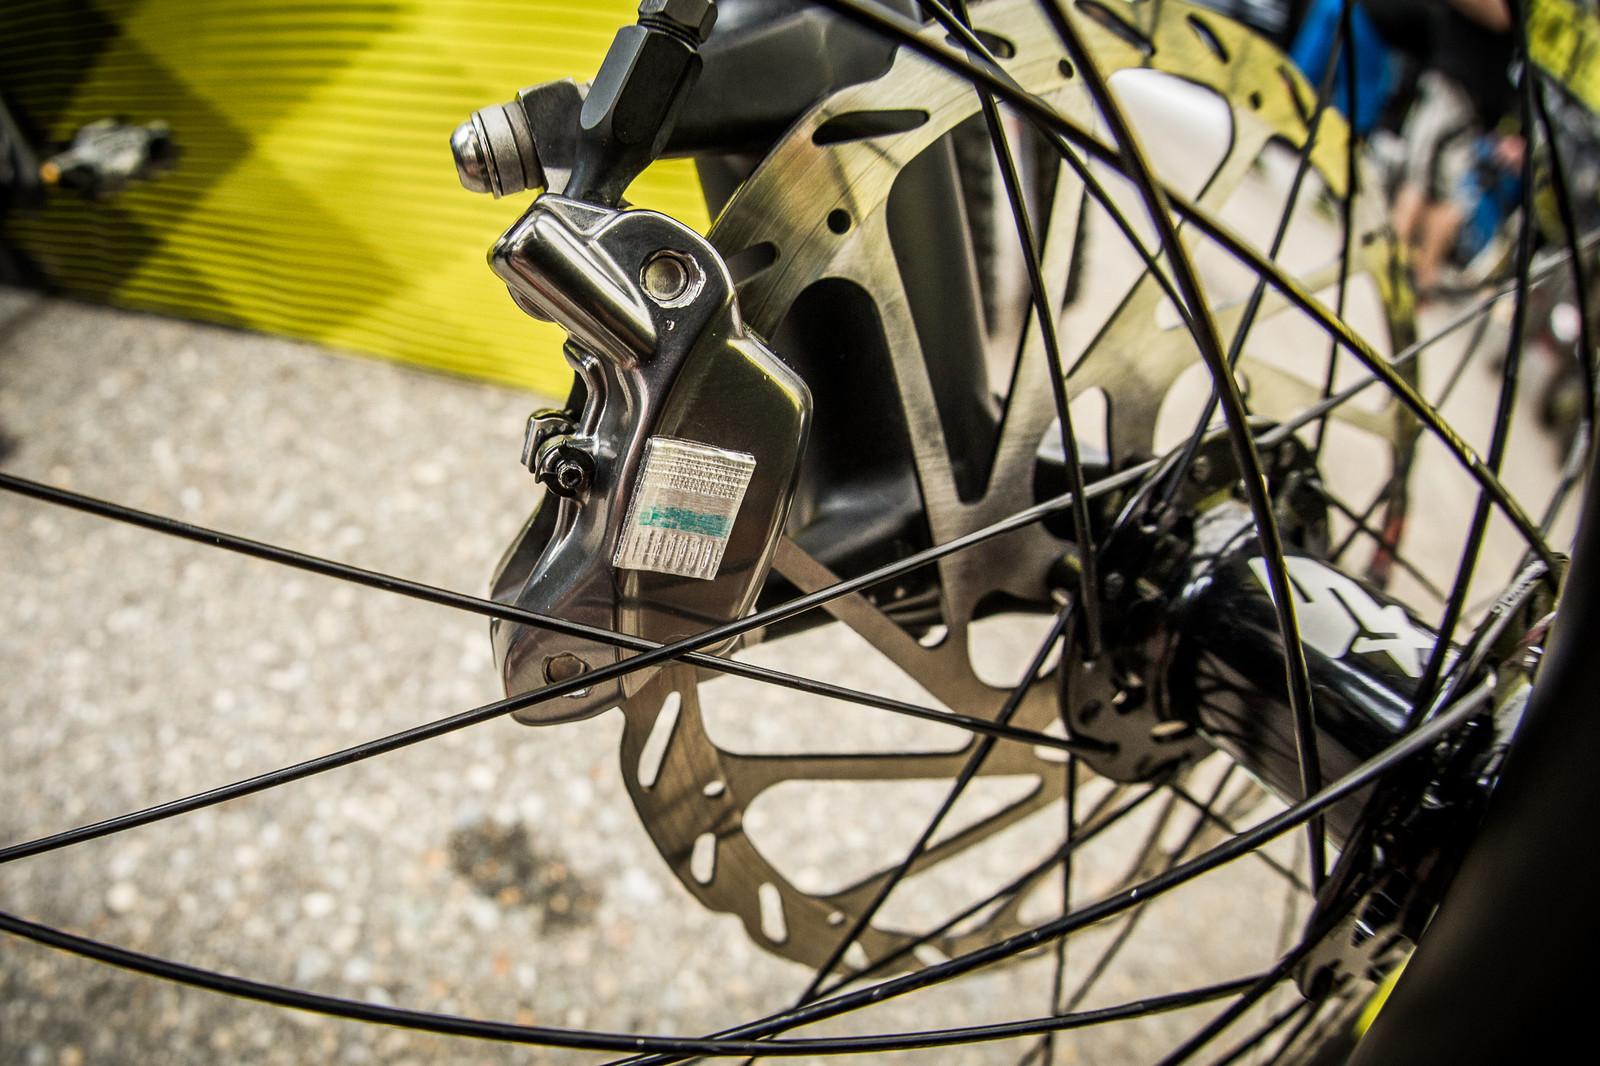 High-tech Axxios AXS Anti-Vibration System on Commencal DH Bikes - High-tech Anti-Vibration System on Commencal DH Bikes - Mountain Biking Pictures - Vital MTB